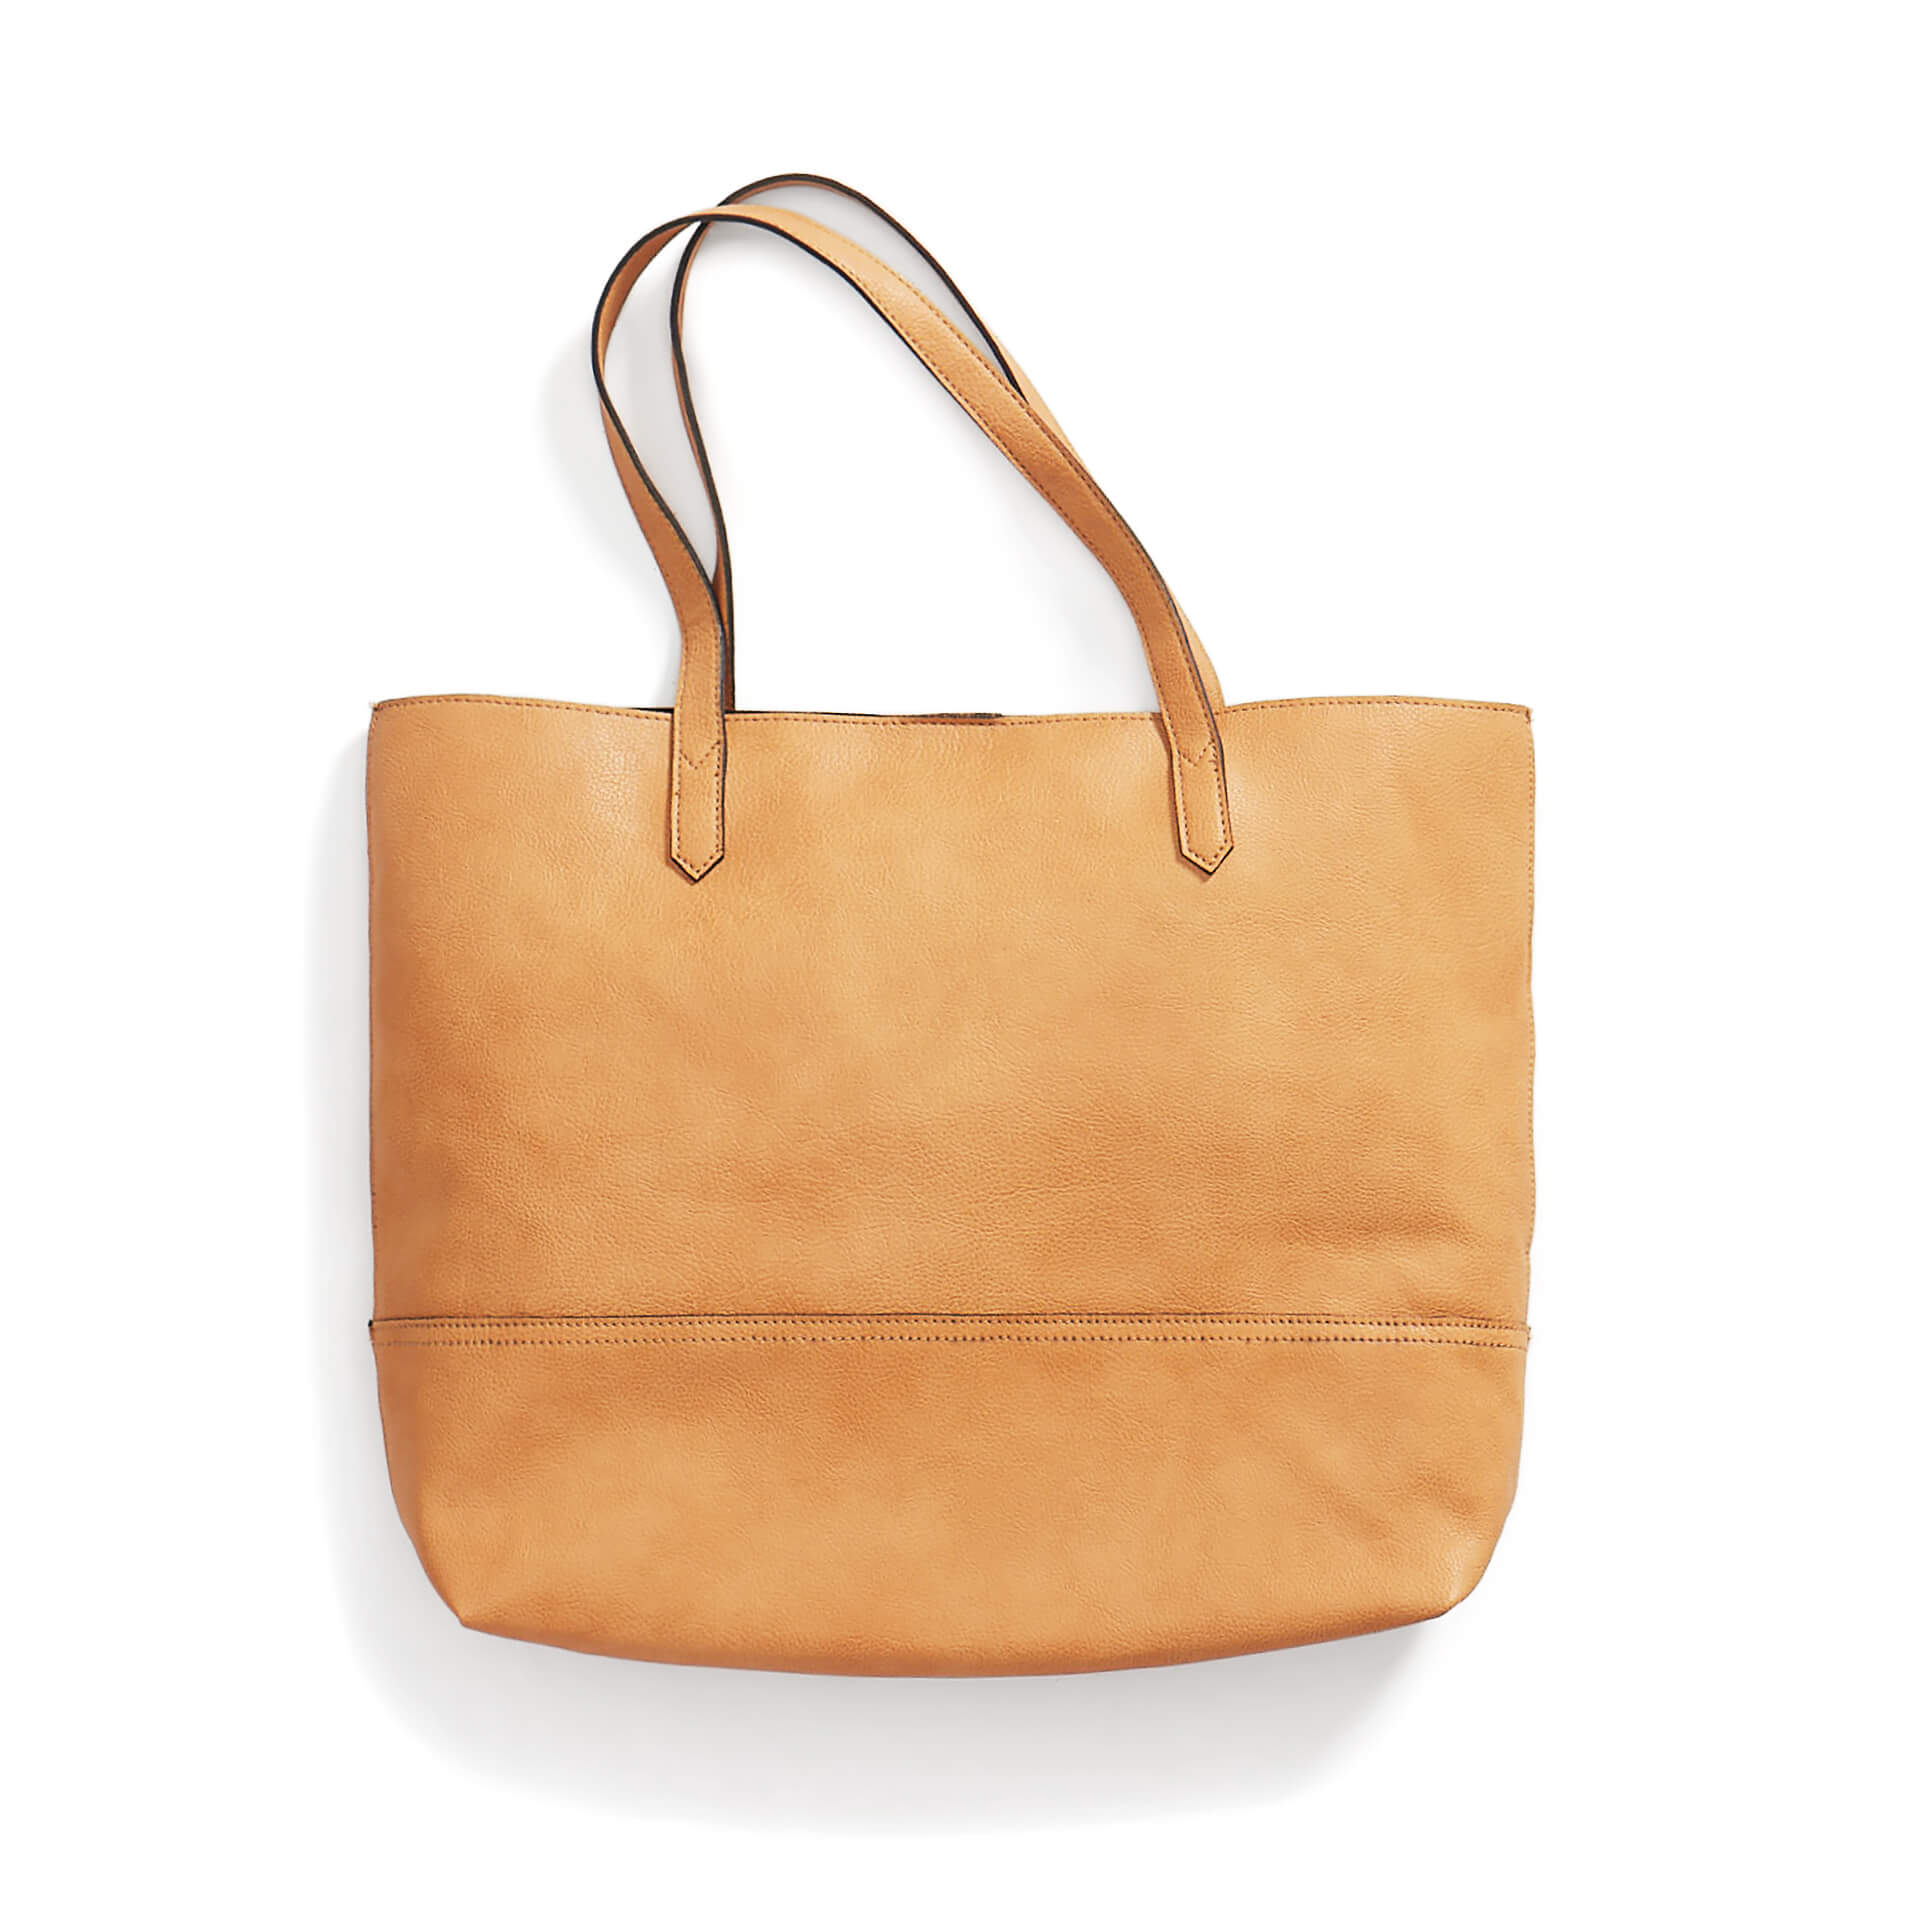 4 Must-Have Handbag Trends for Spring